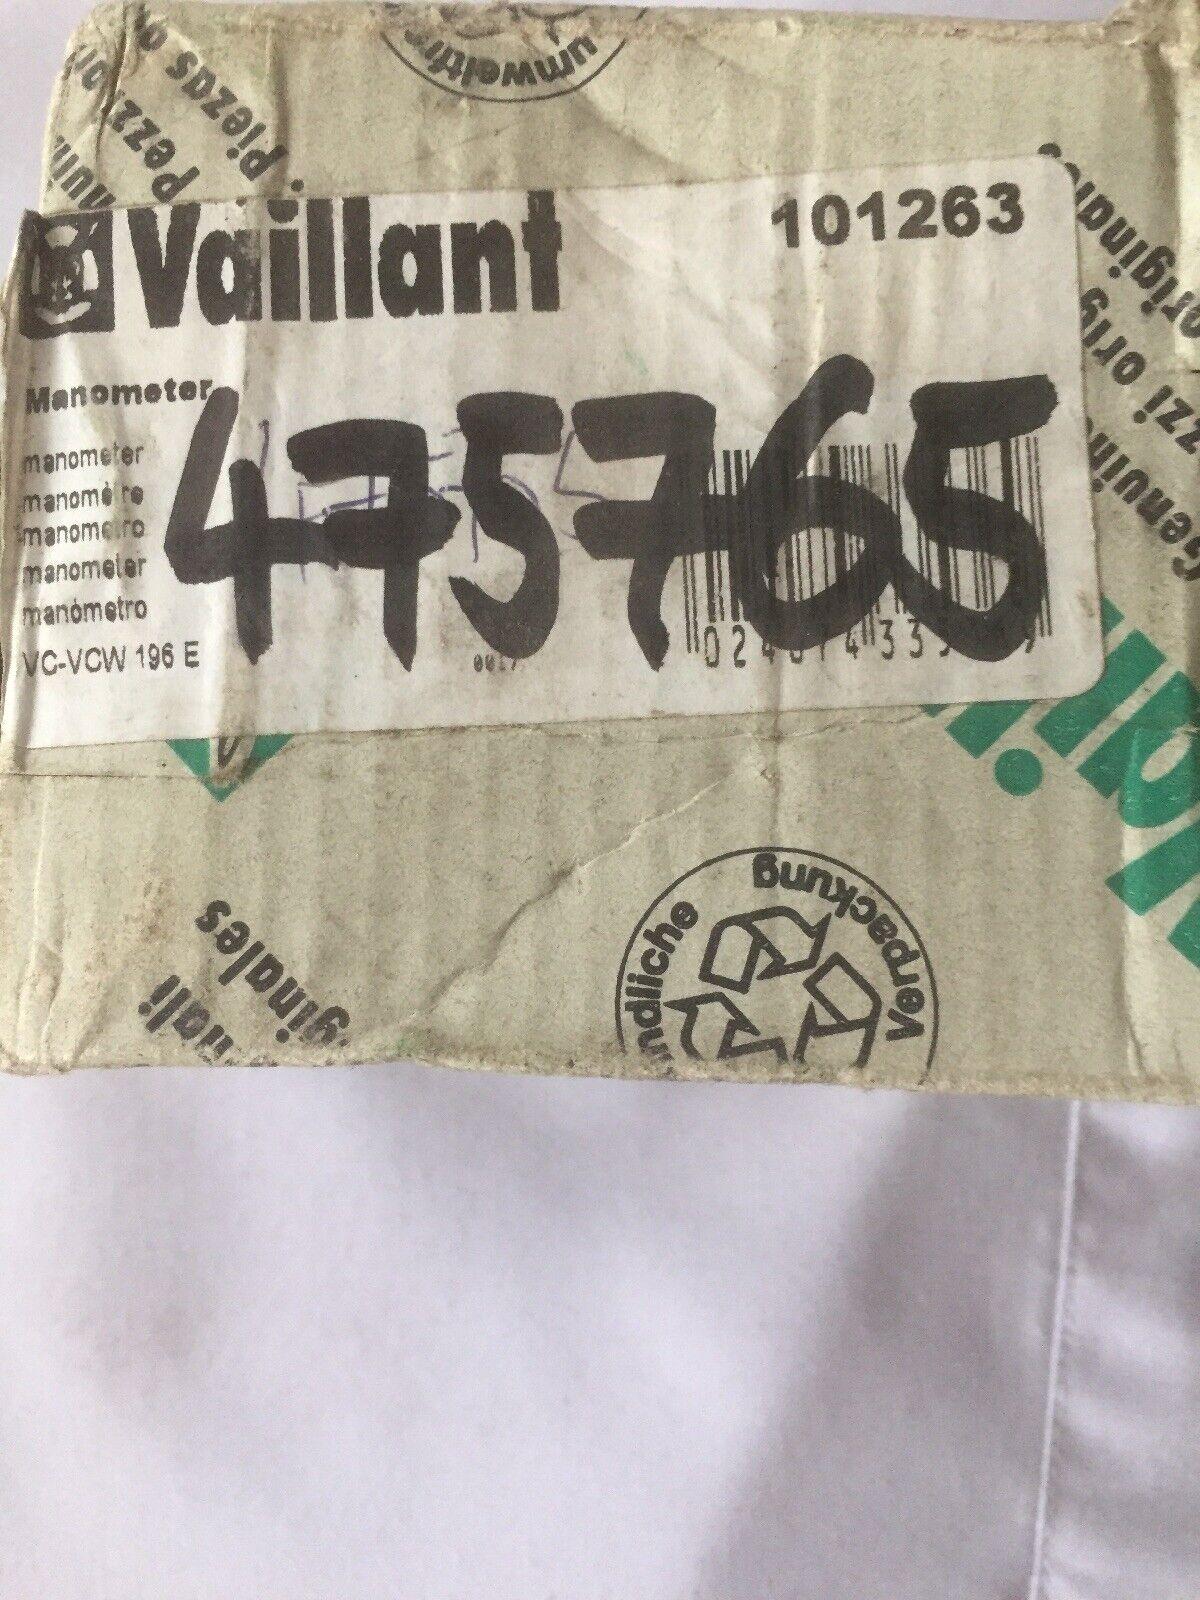 VAILLANT ECOMAX 613 618 622 /& VU 146 196 246 E-C BOILER PRESSURE GAUGE  101263